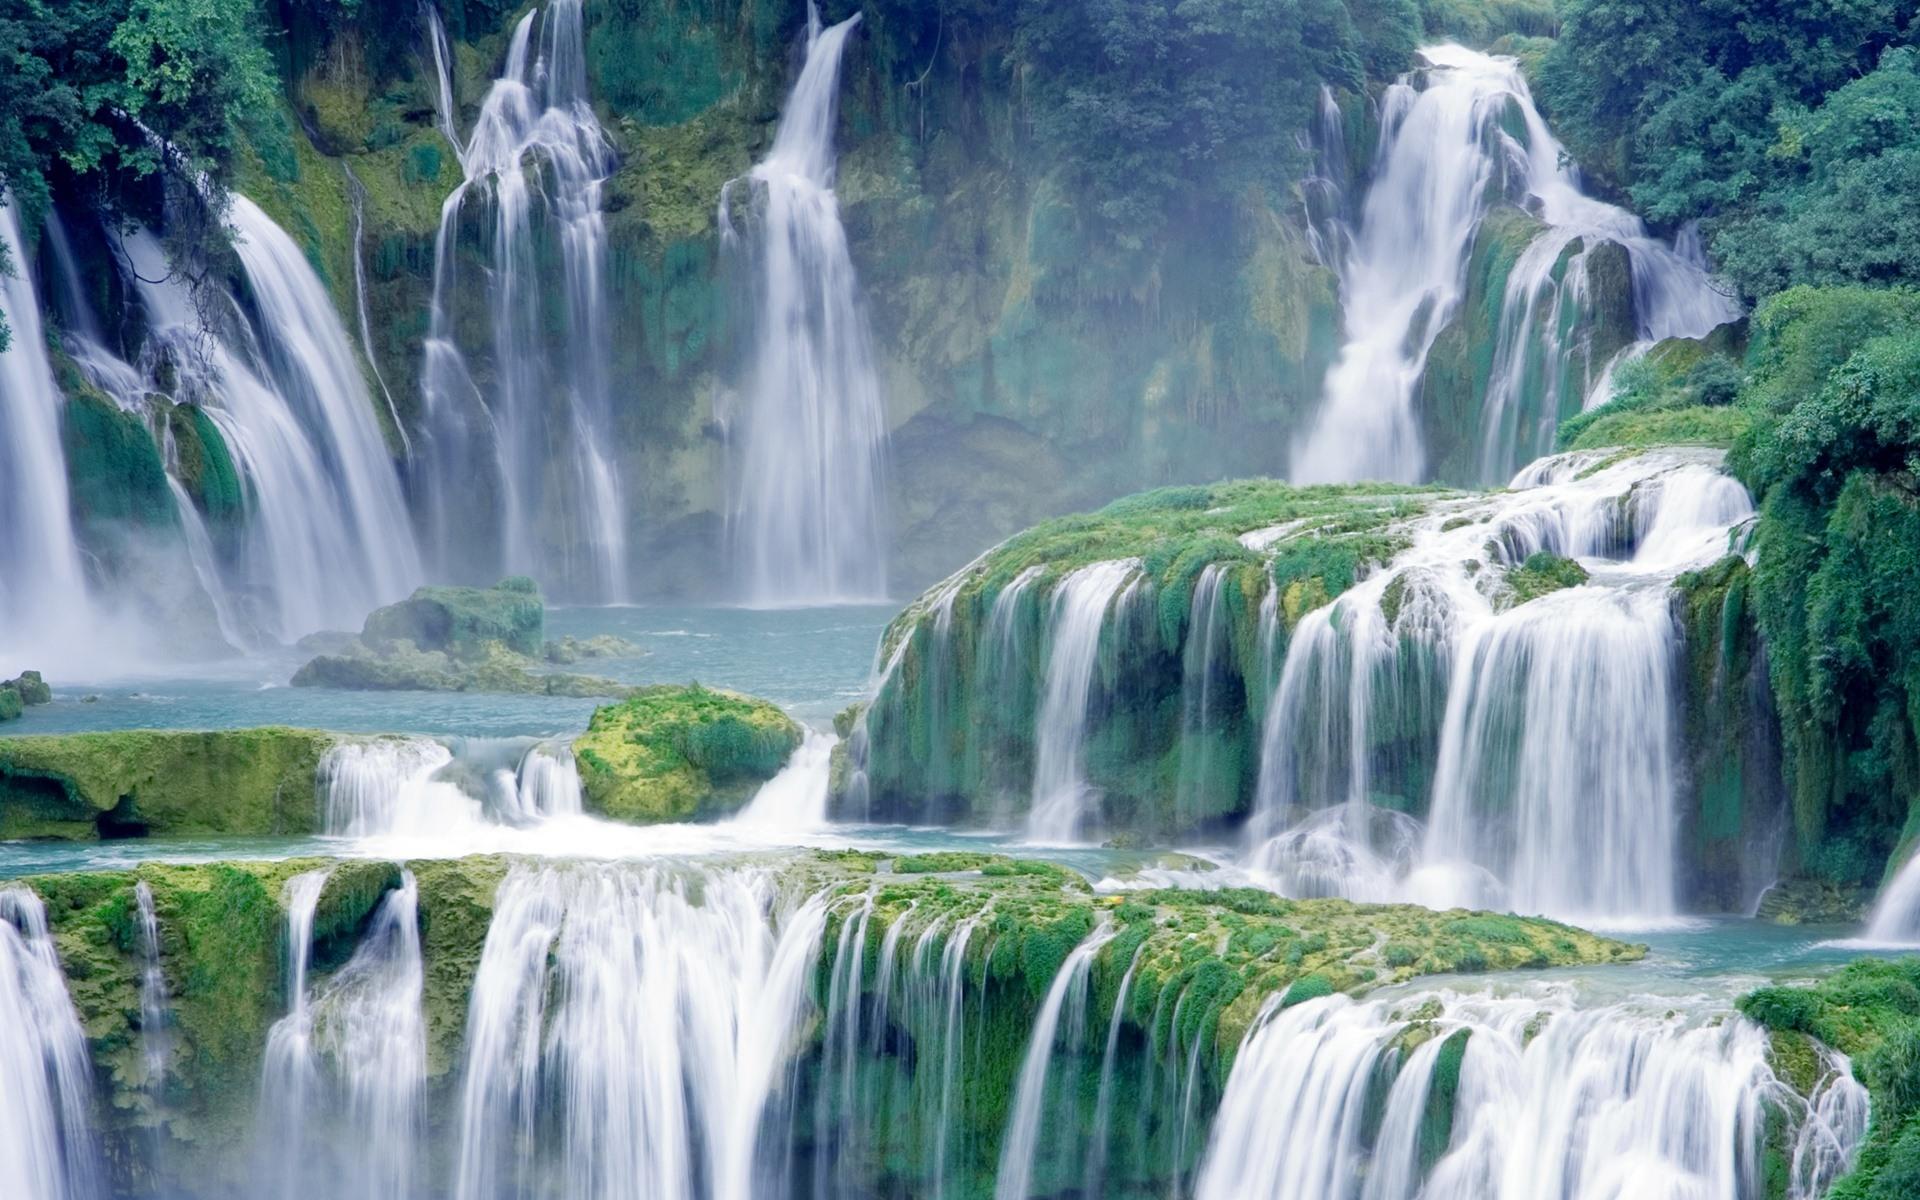 ... Waterfalls; Waterfalls; Waterfalls; Waterfalls